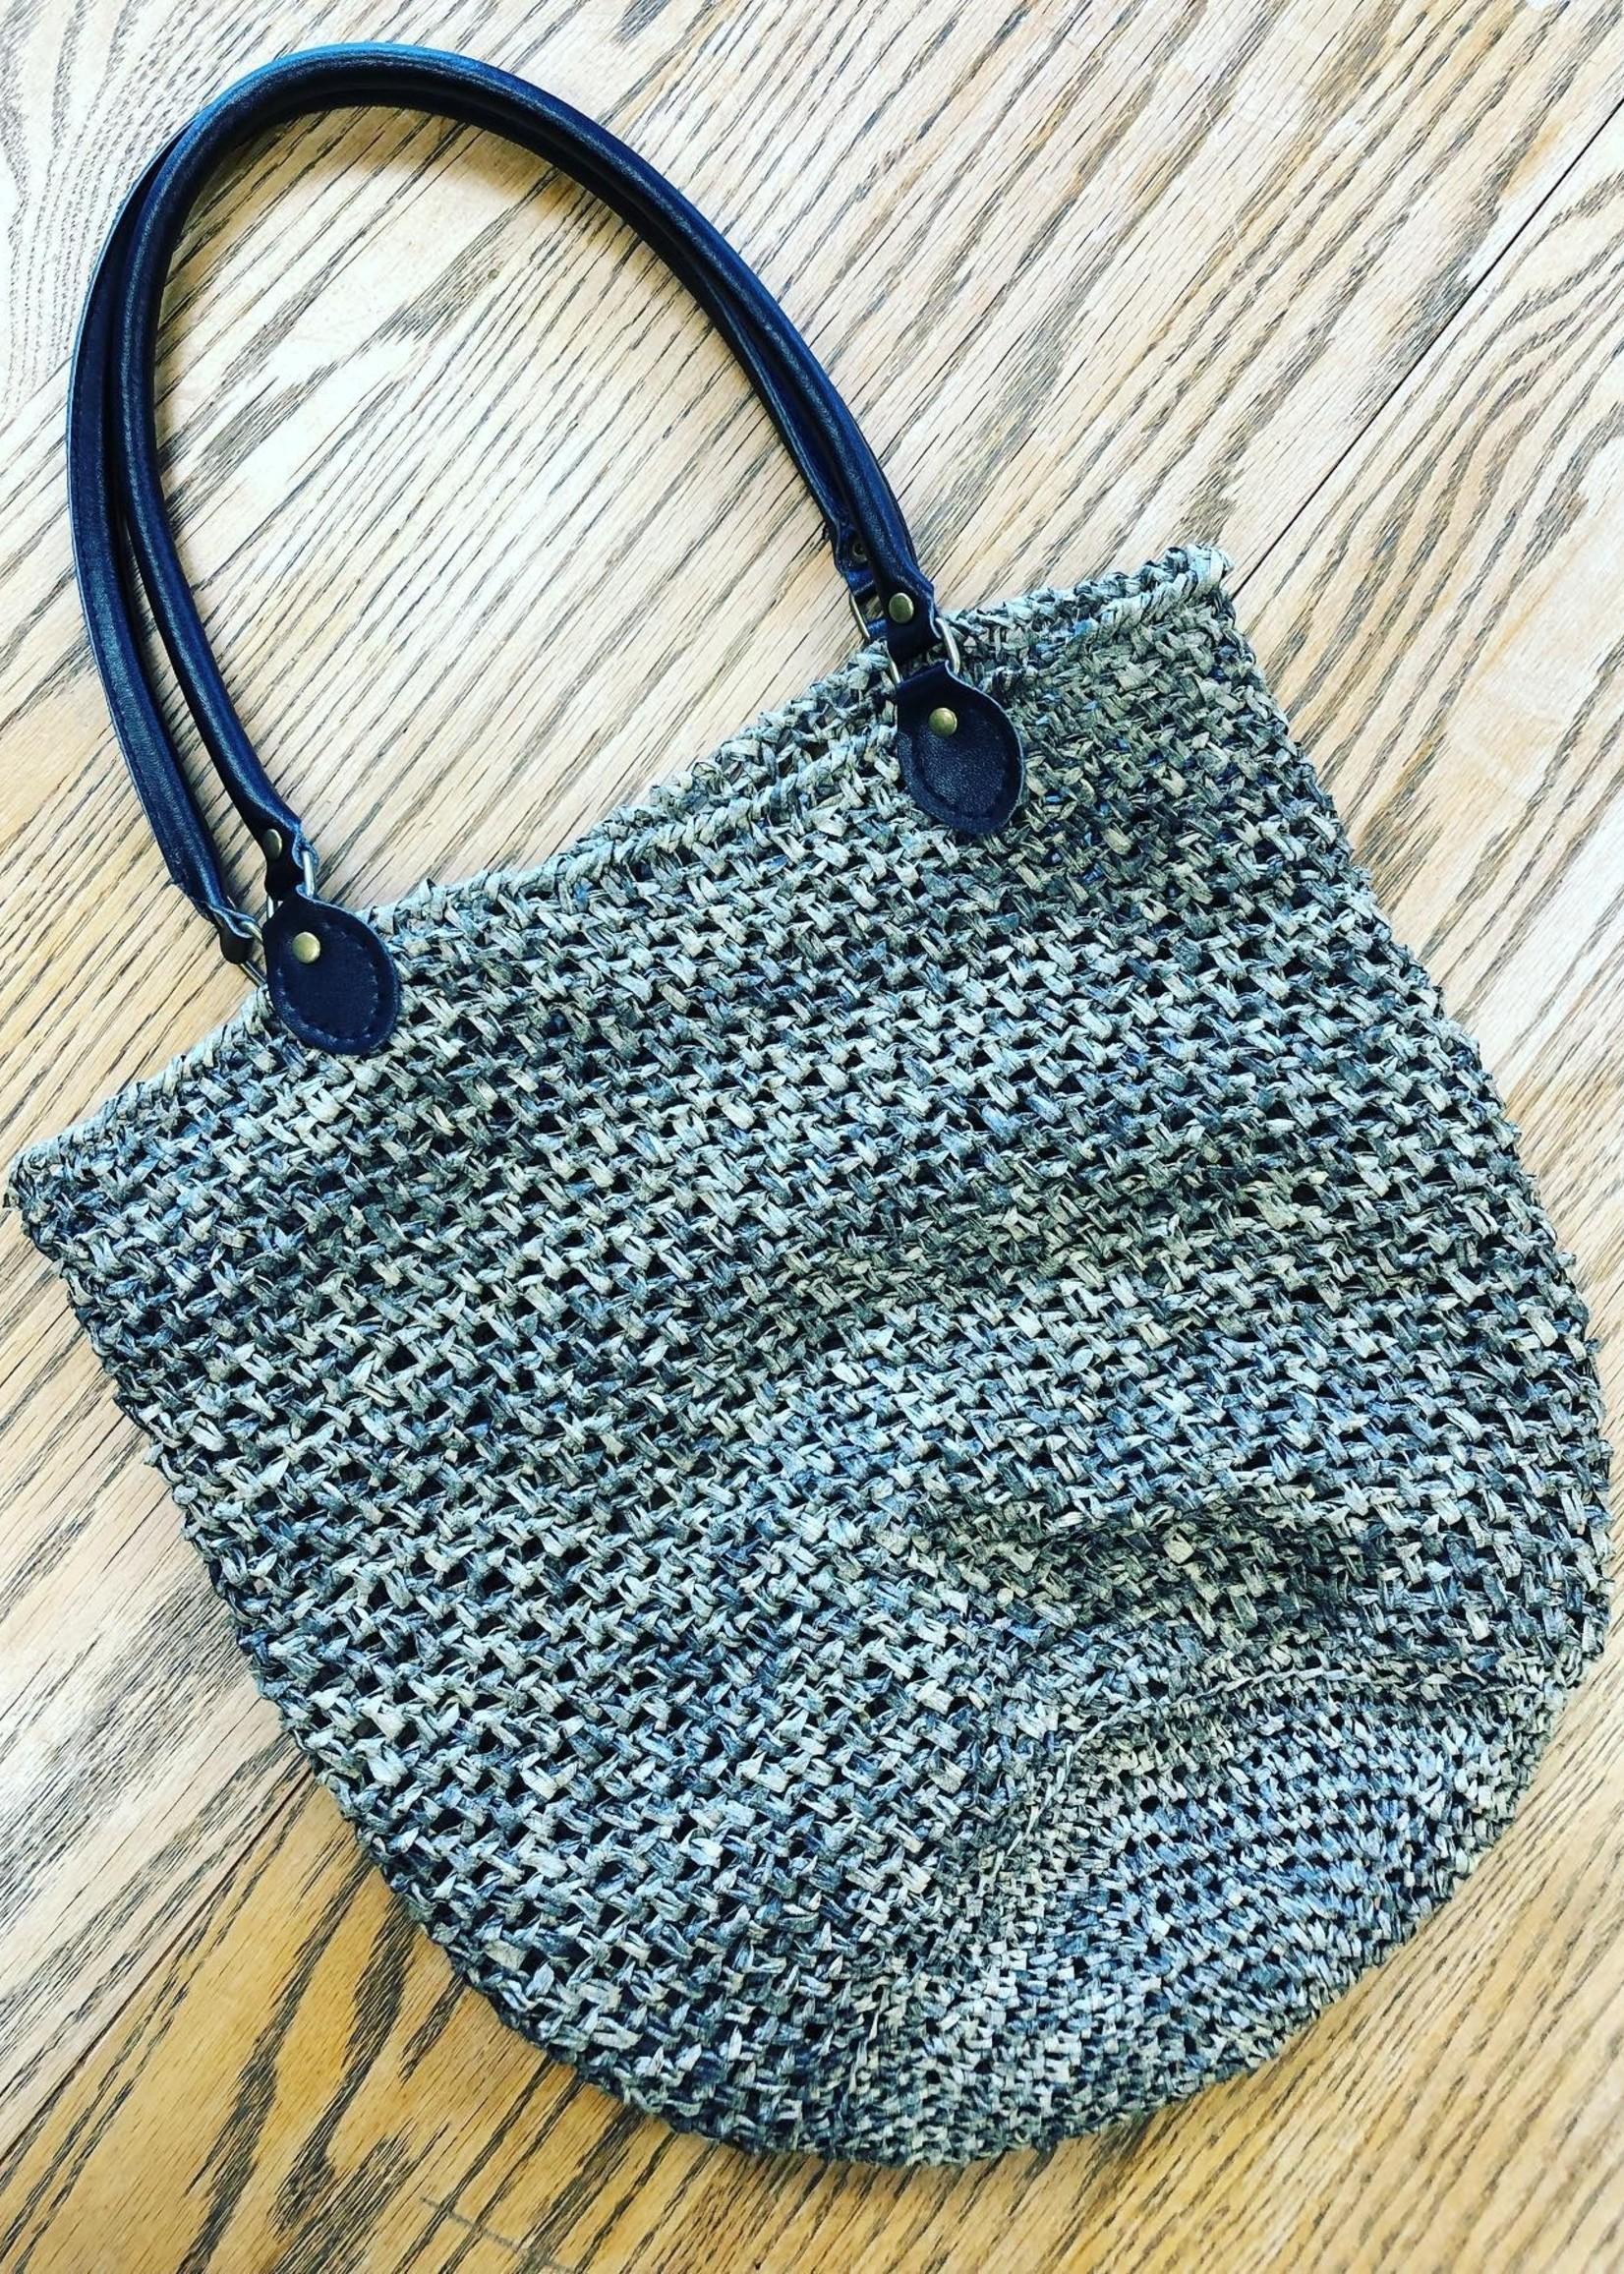 Spun Fibre Leather Bag Handles